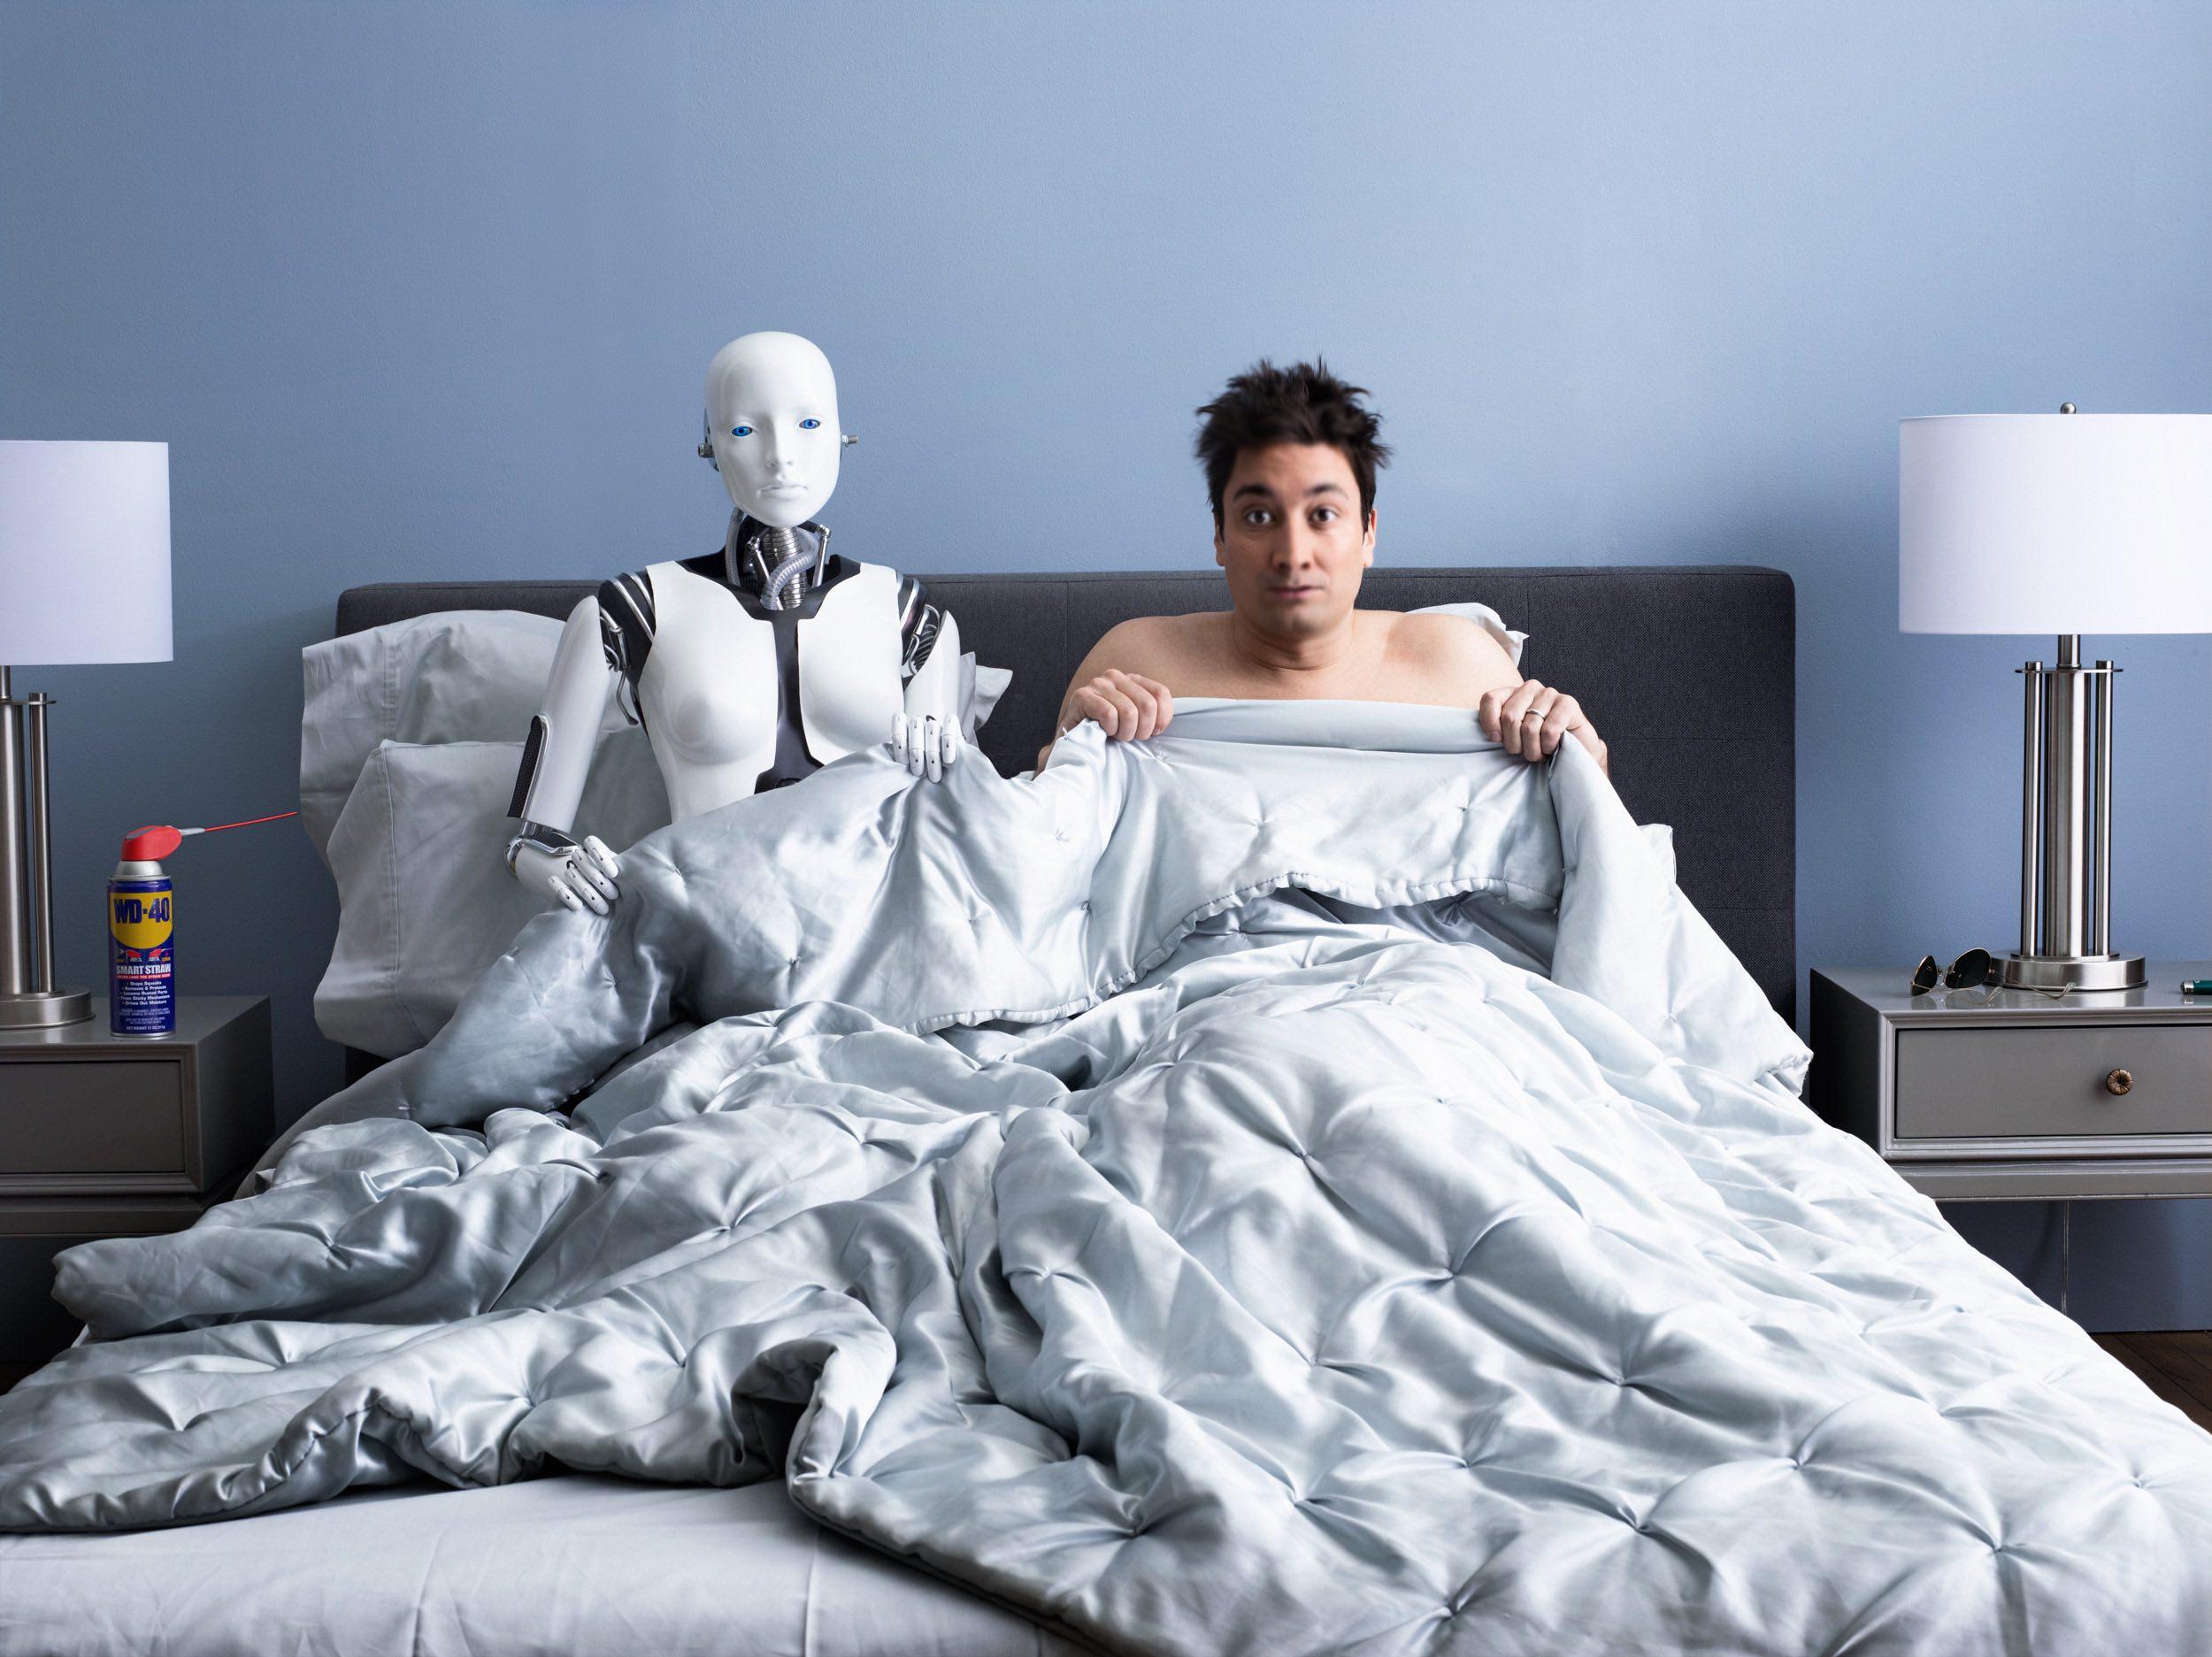 AI 2017 human robot marriage relation